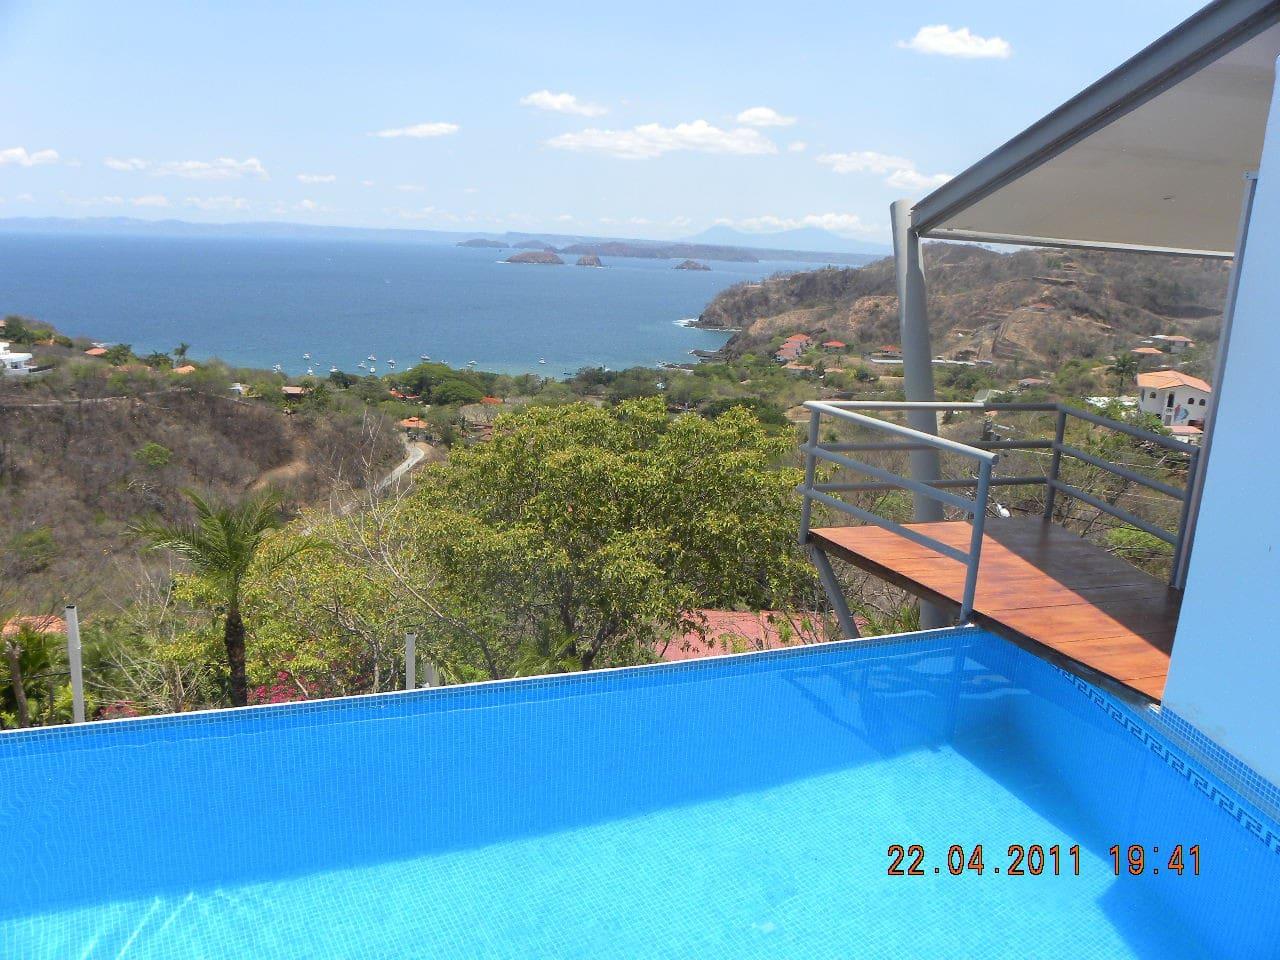 Beauty HousePlaya Ocotal Guanacaste